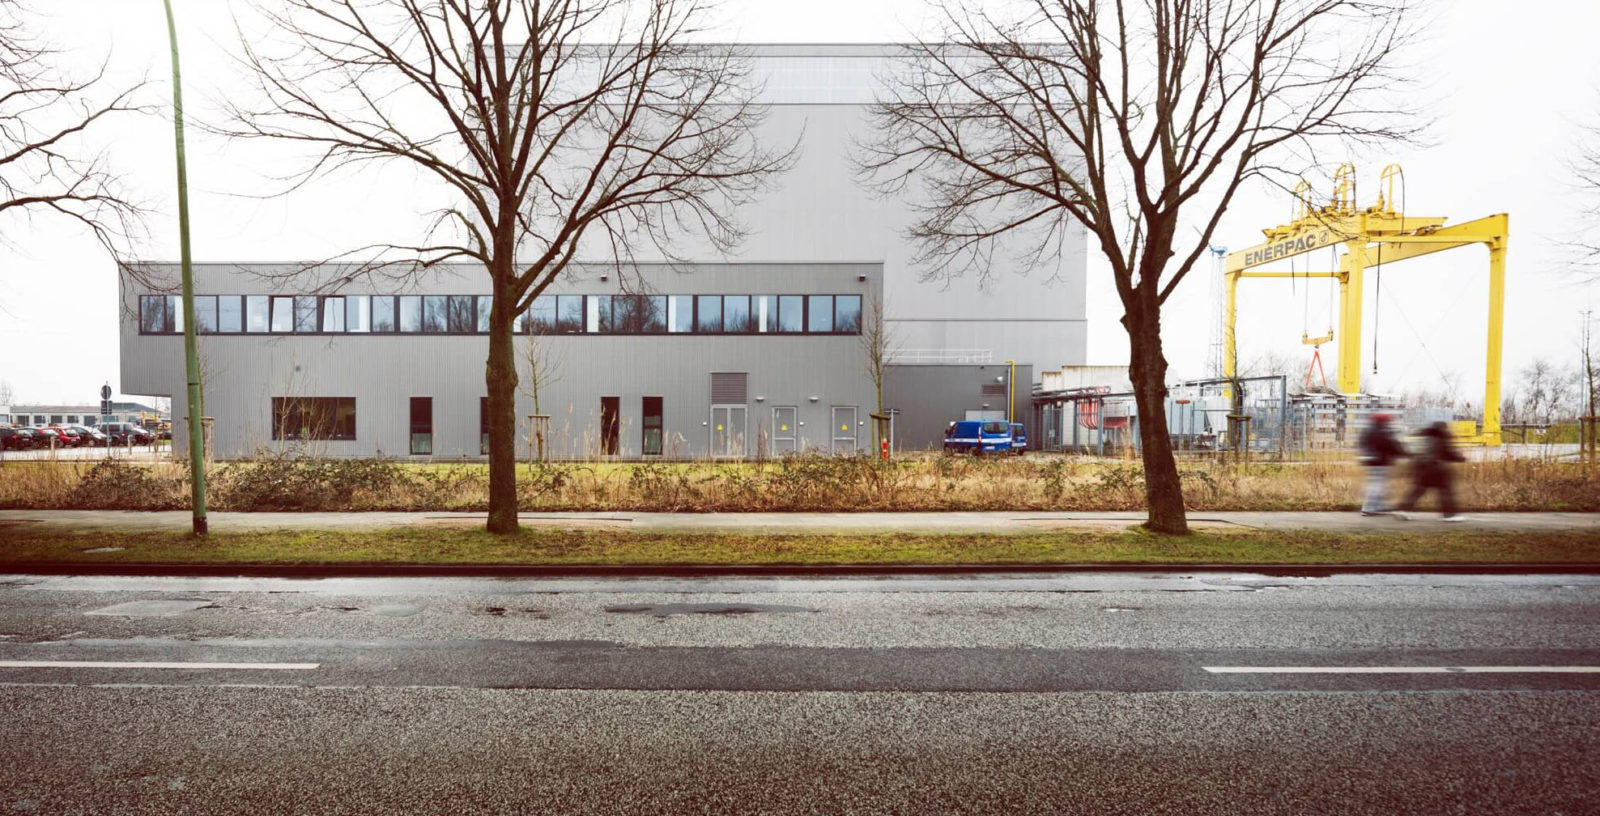 DyNaLab_Wind_Nacelle_Test_Bench_Fraunhofer IWES Germany_IDOM_ADA (3)